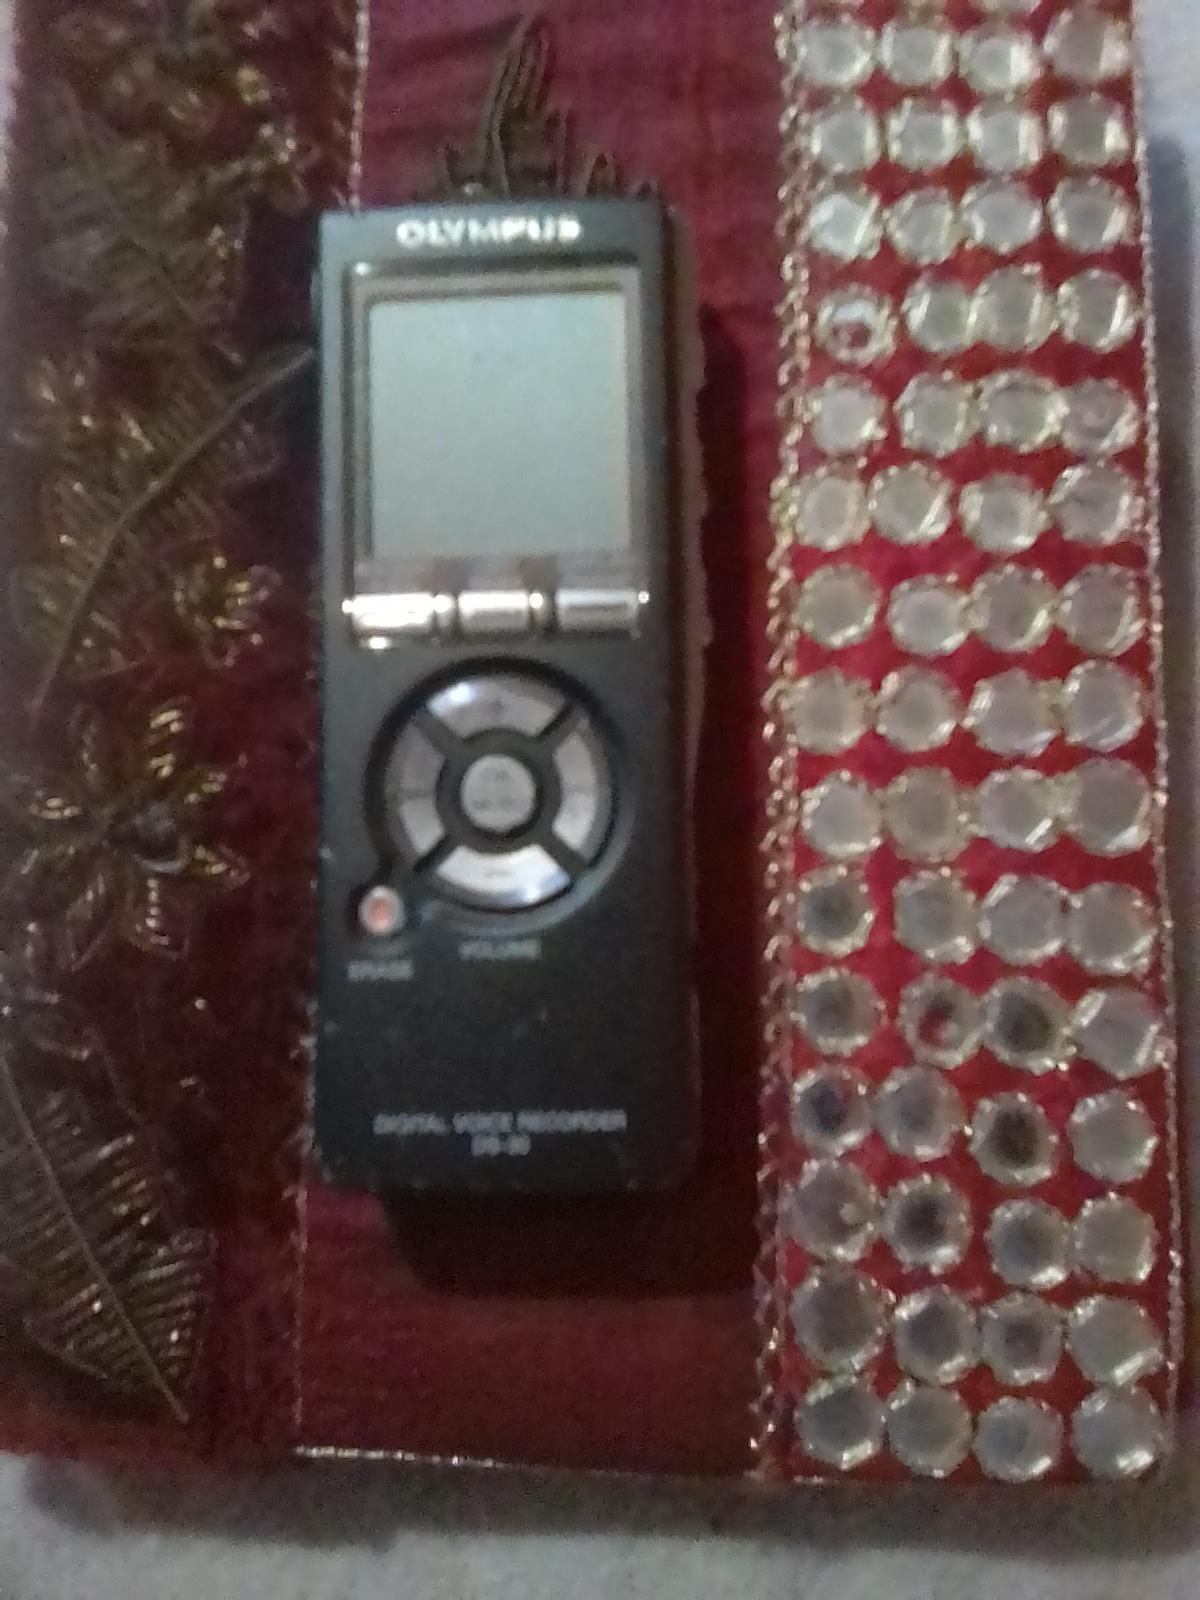 Digital voice recorder DS-30 Olympus.